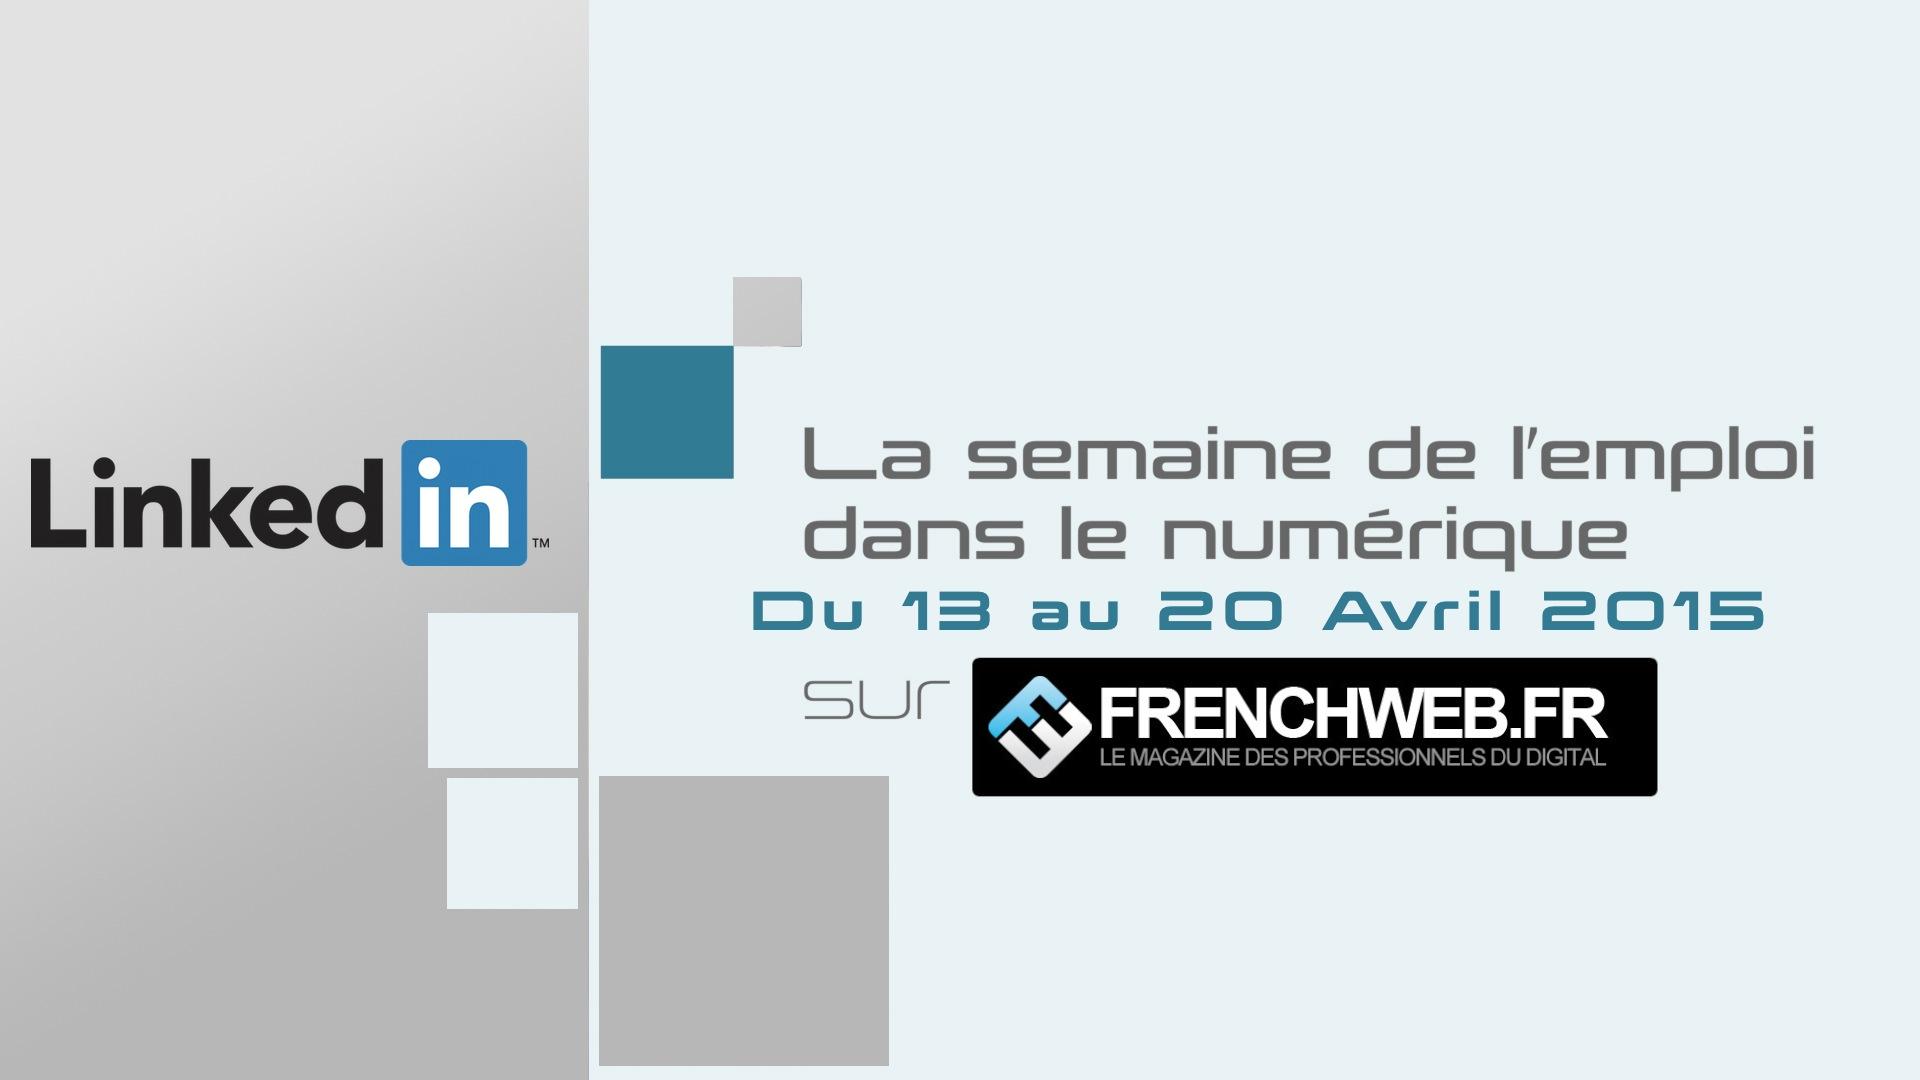 FrenchWeb_senfw3_linkedin-1